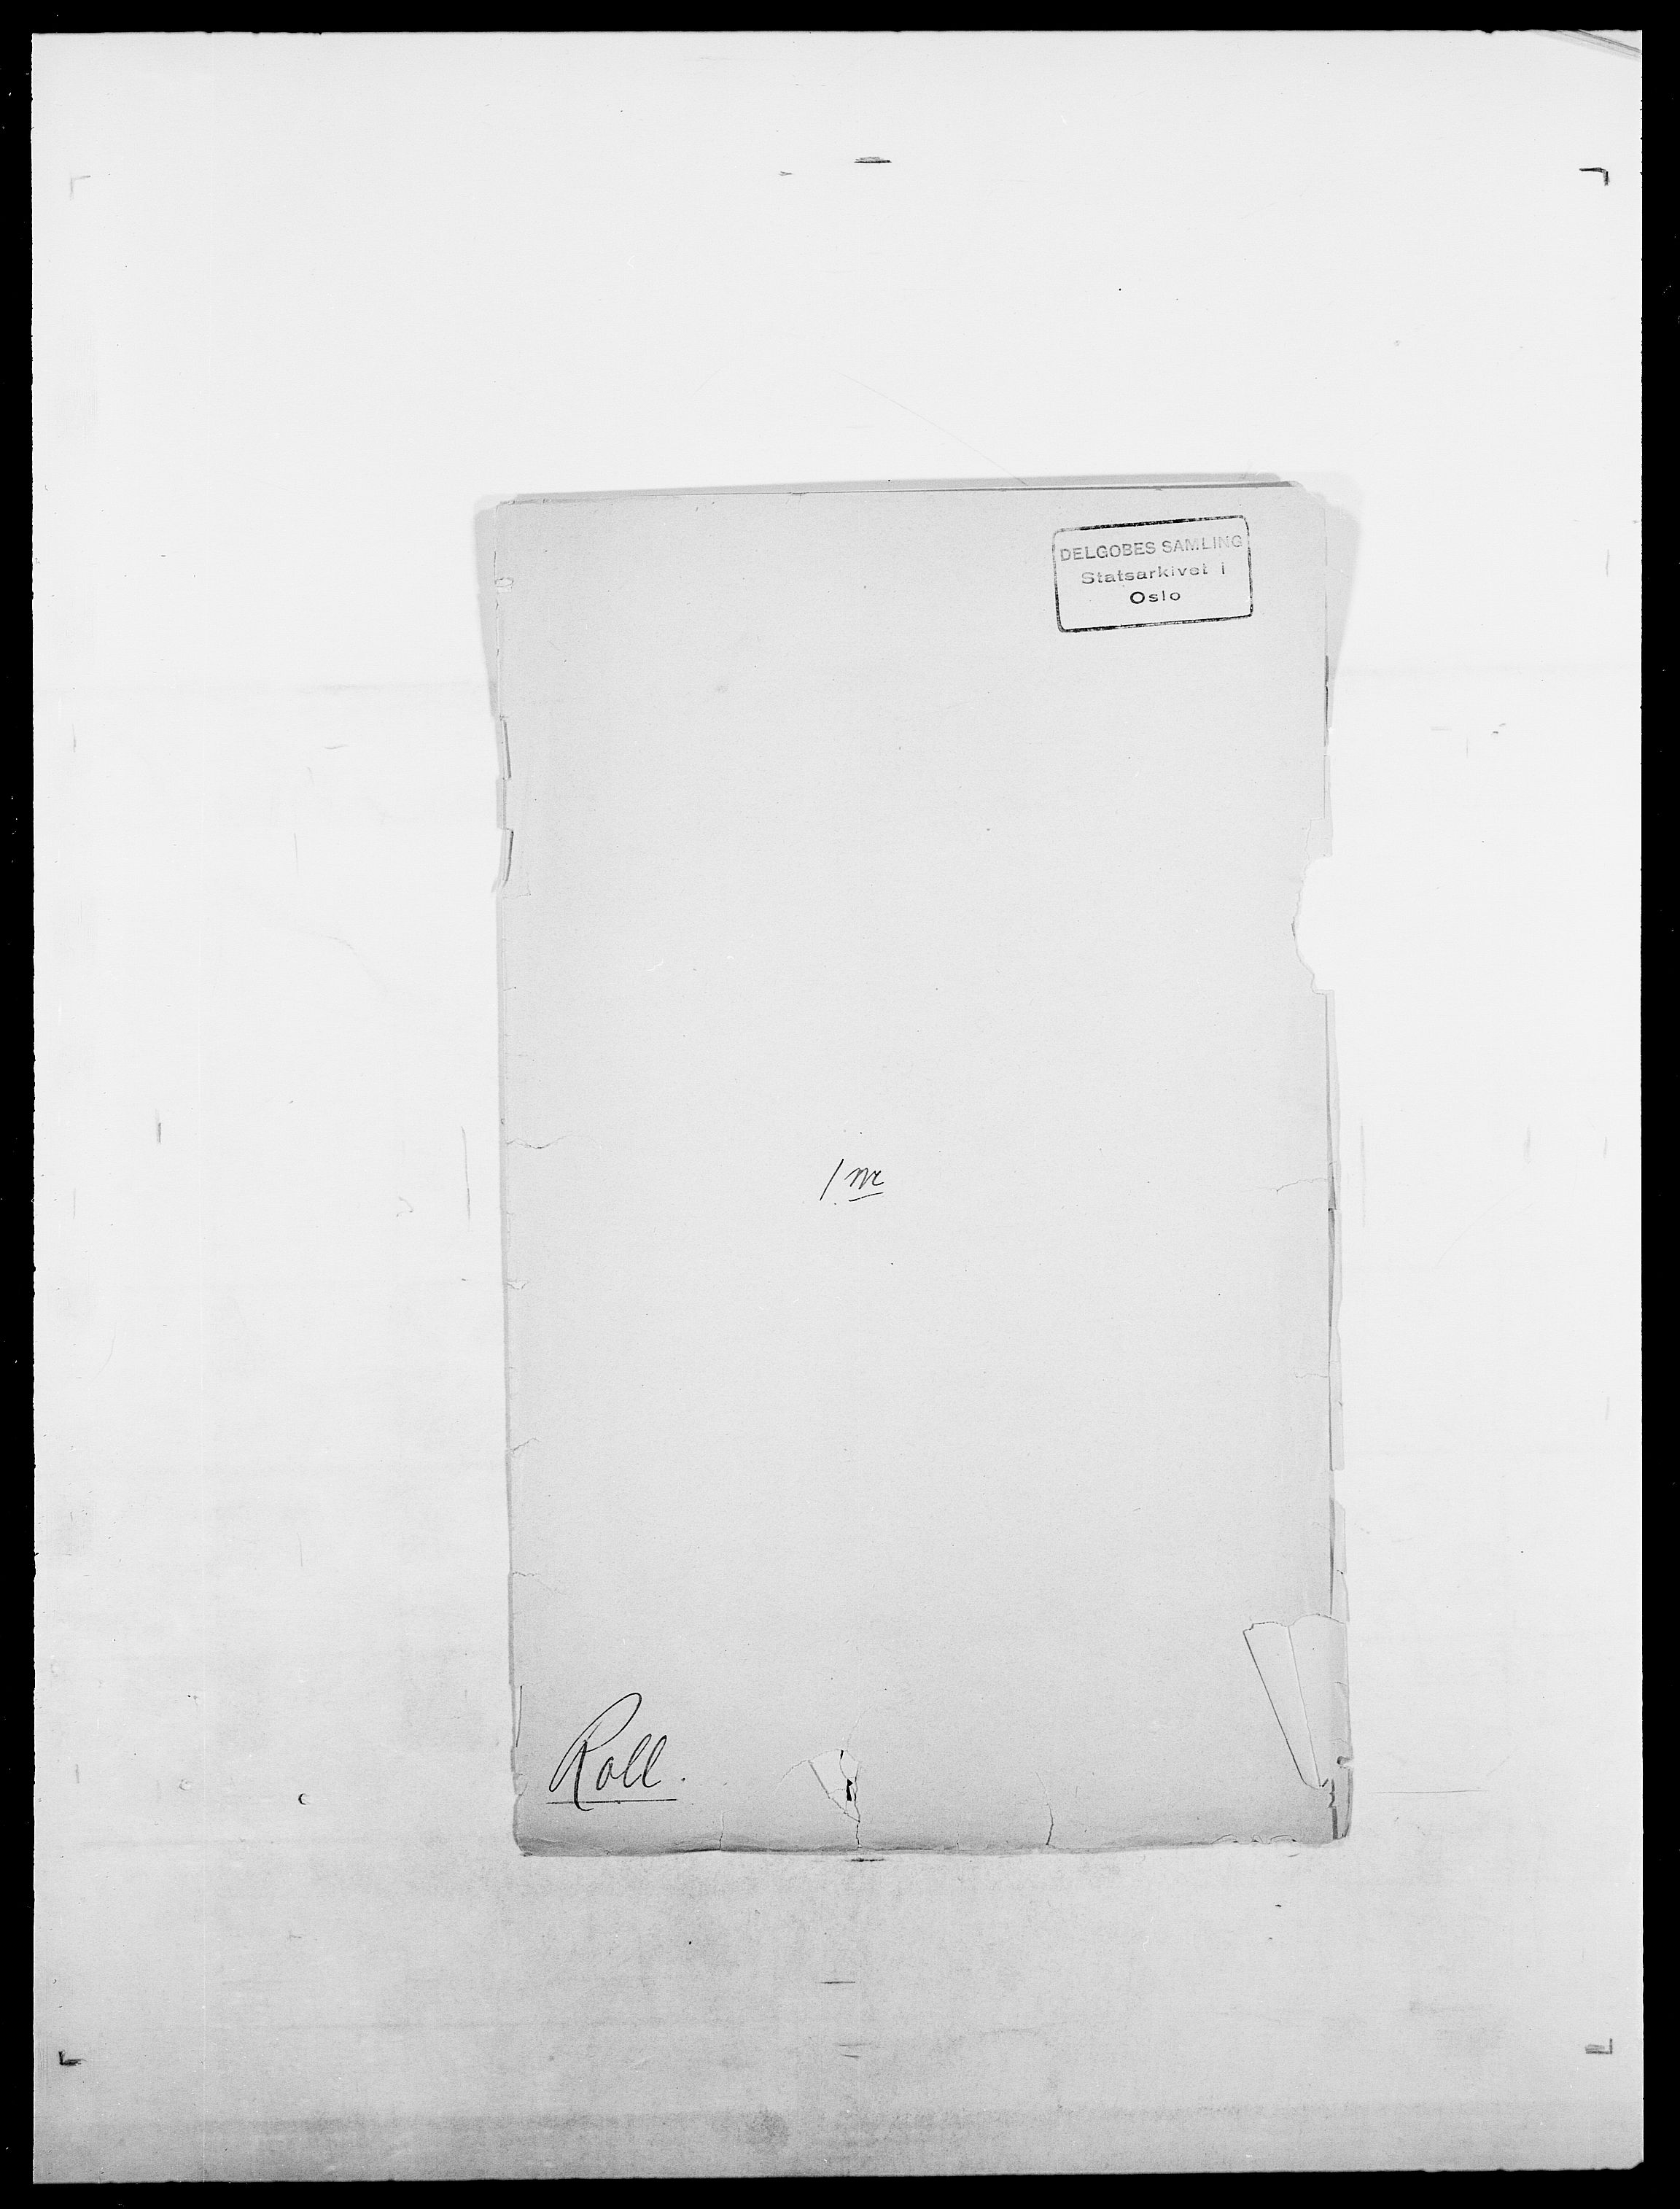 SAO, Delgobe, Charles Antoine - samling, D/Da/L0033: Roald - Røyem, s. 147